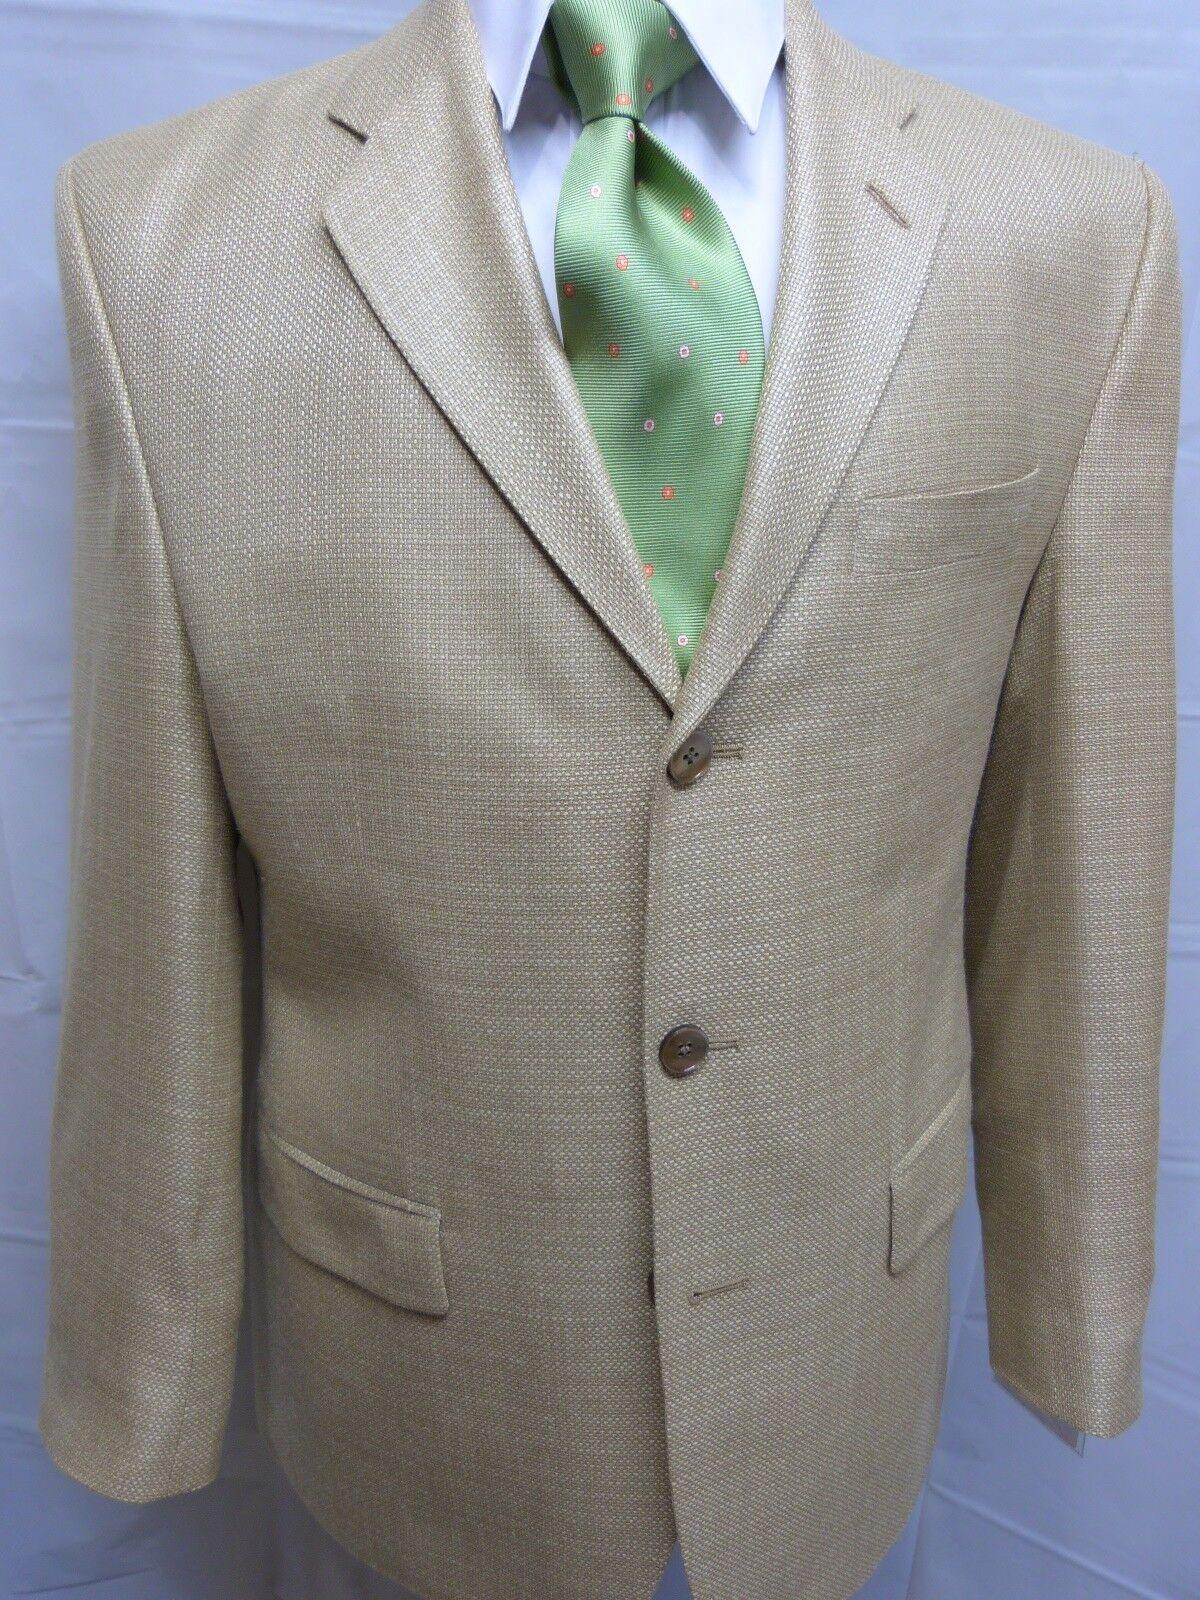 Men's Three Button Sport Coat, Peerless, 40R, 100% Silk, Beige NWT